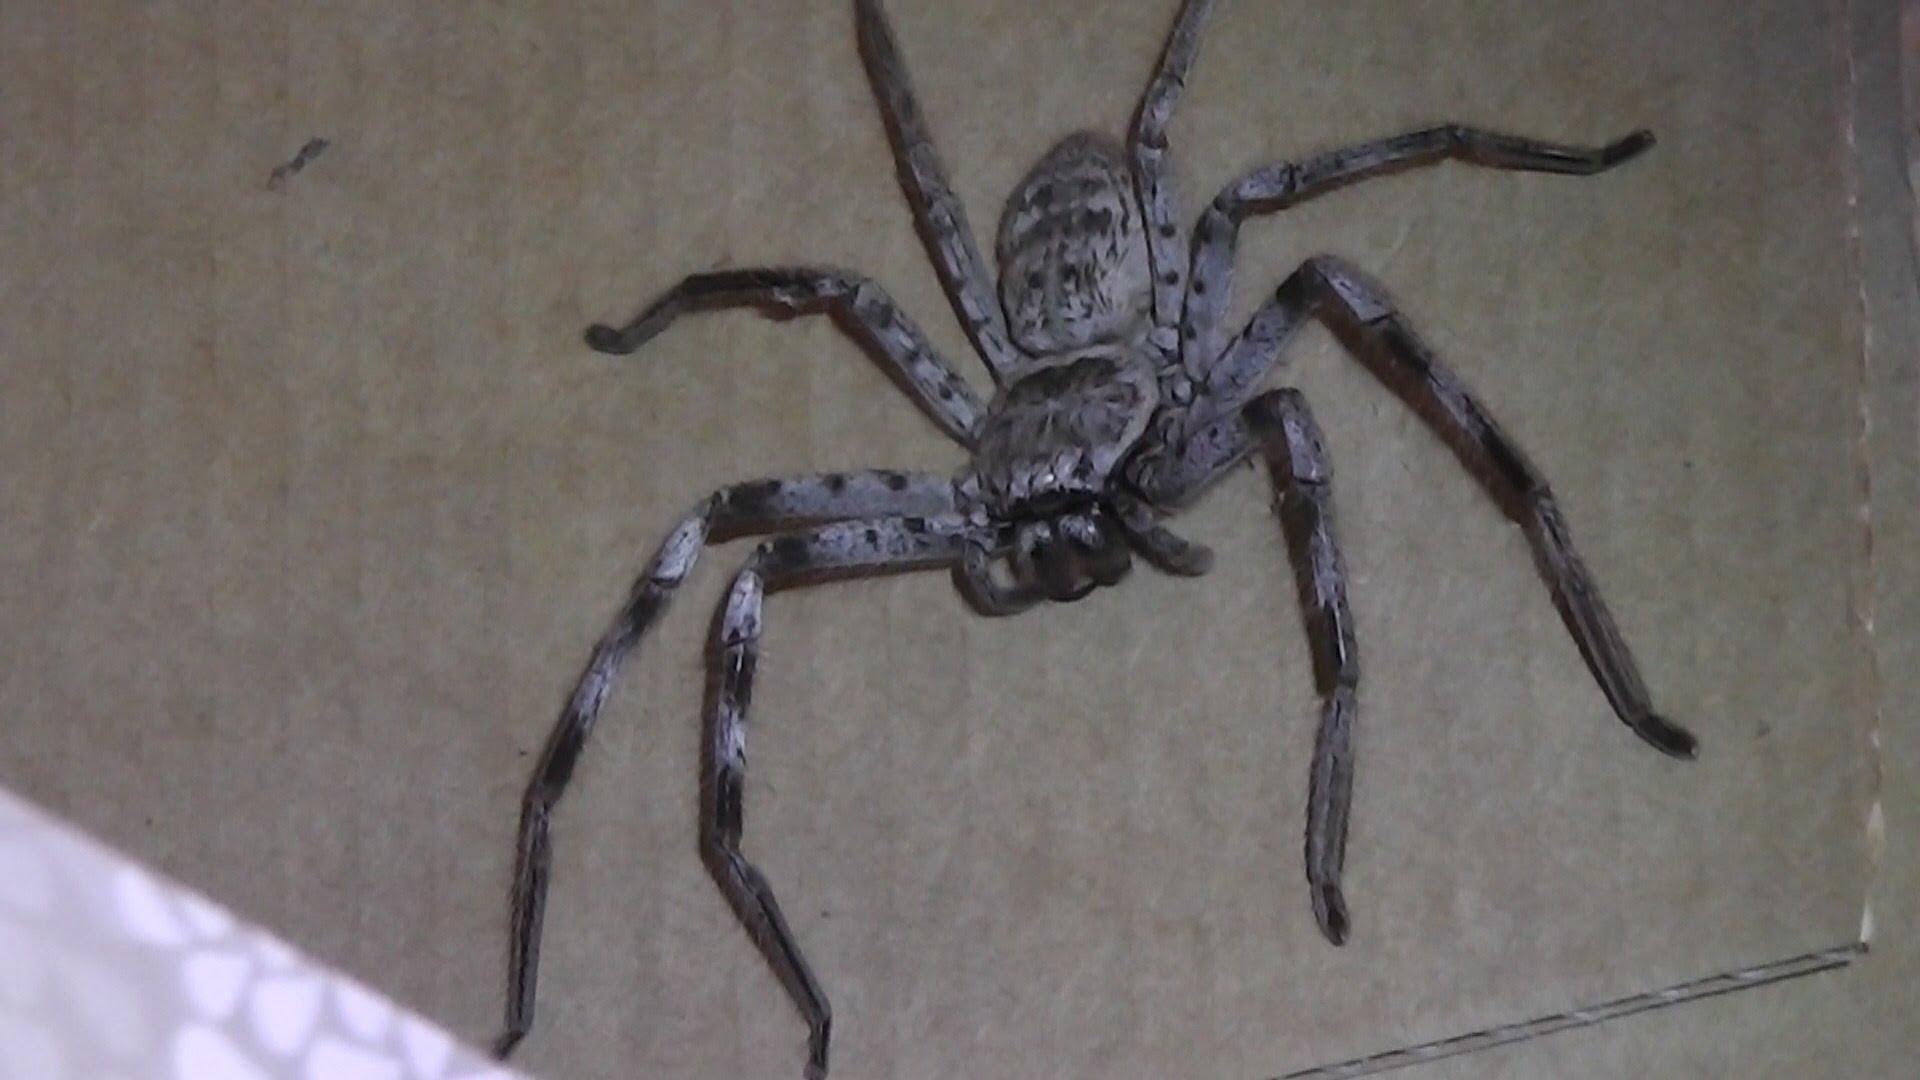 Big Hairy Spider - YouTube